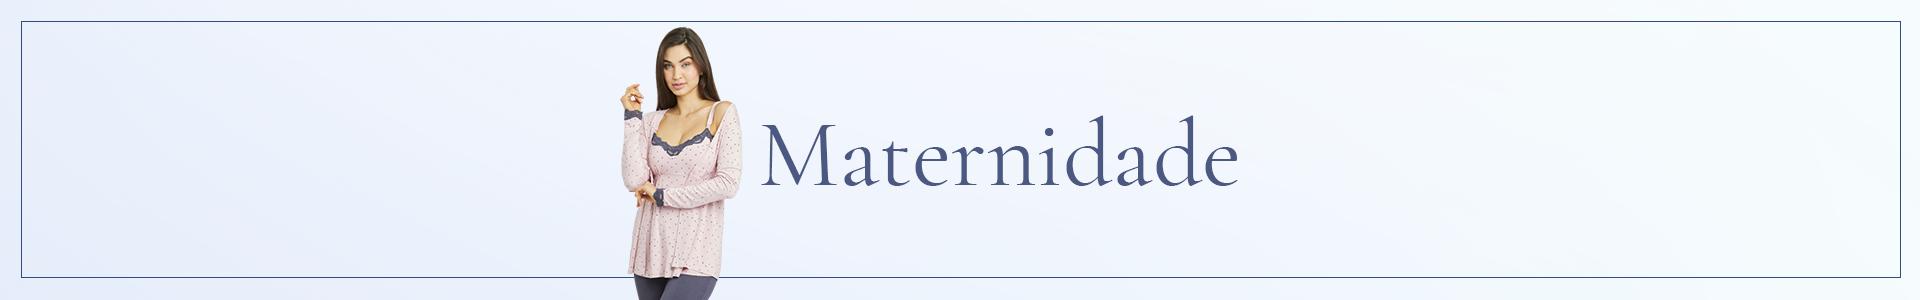 Banner Maternidade